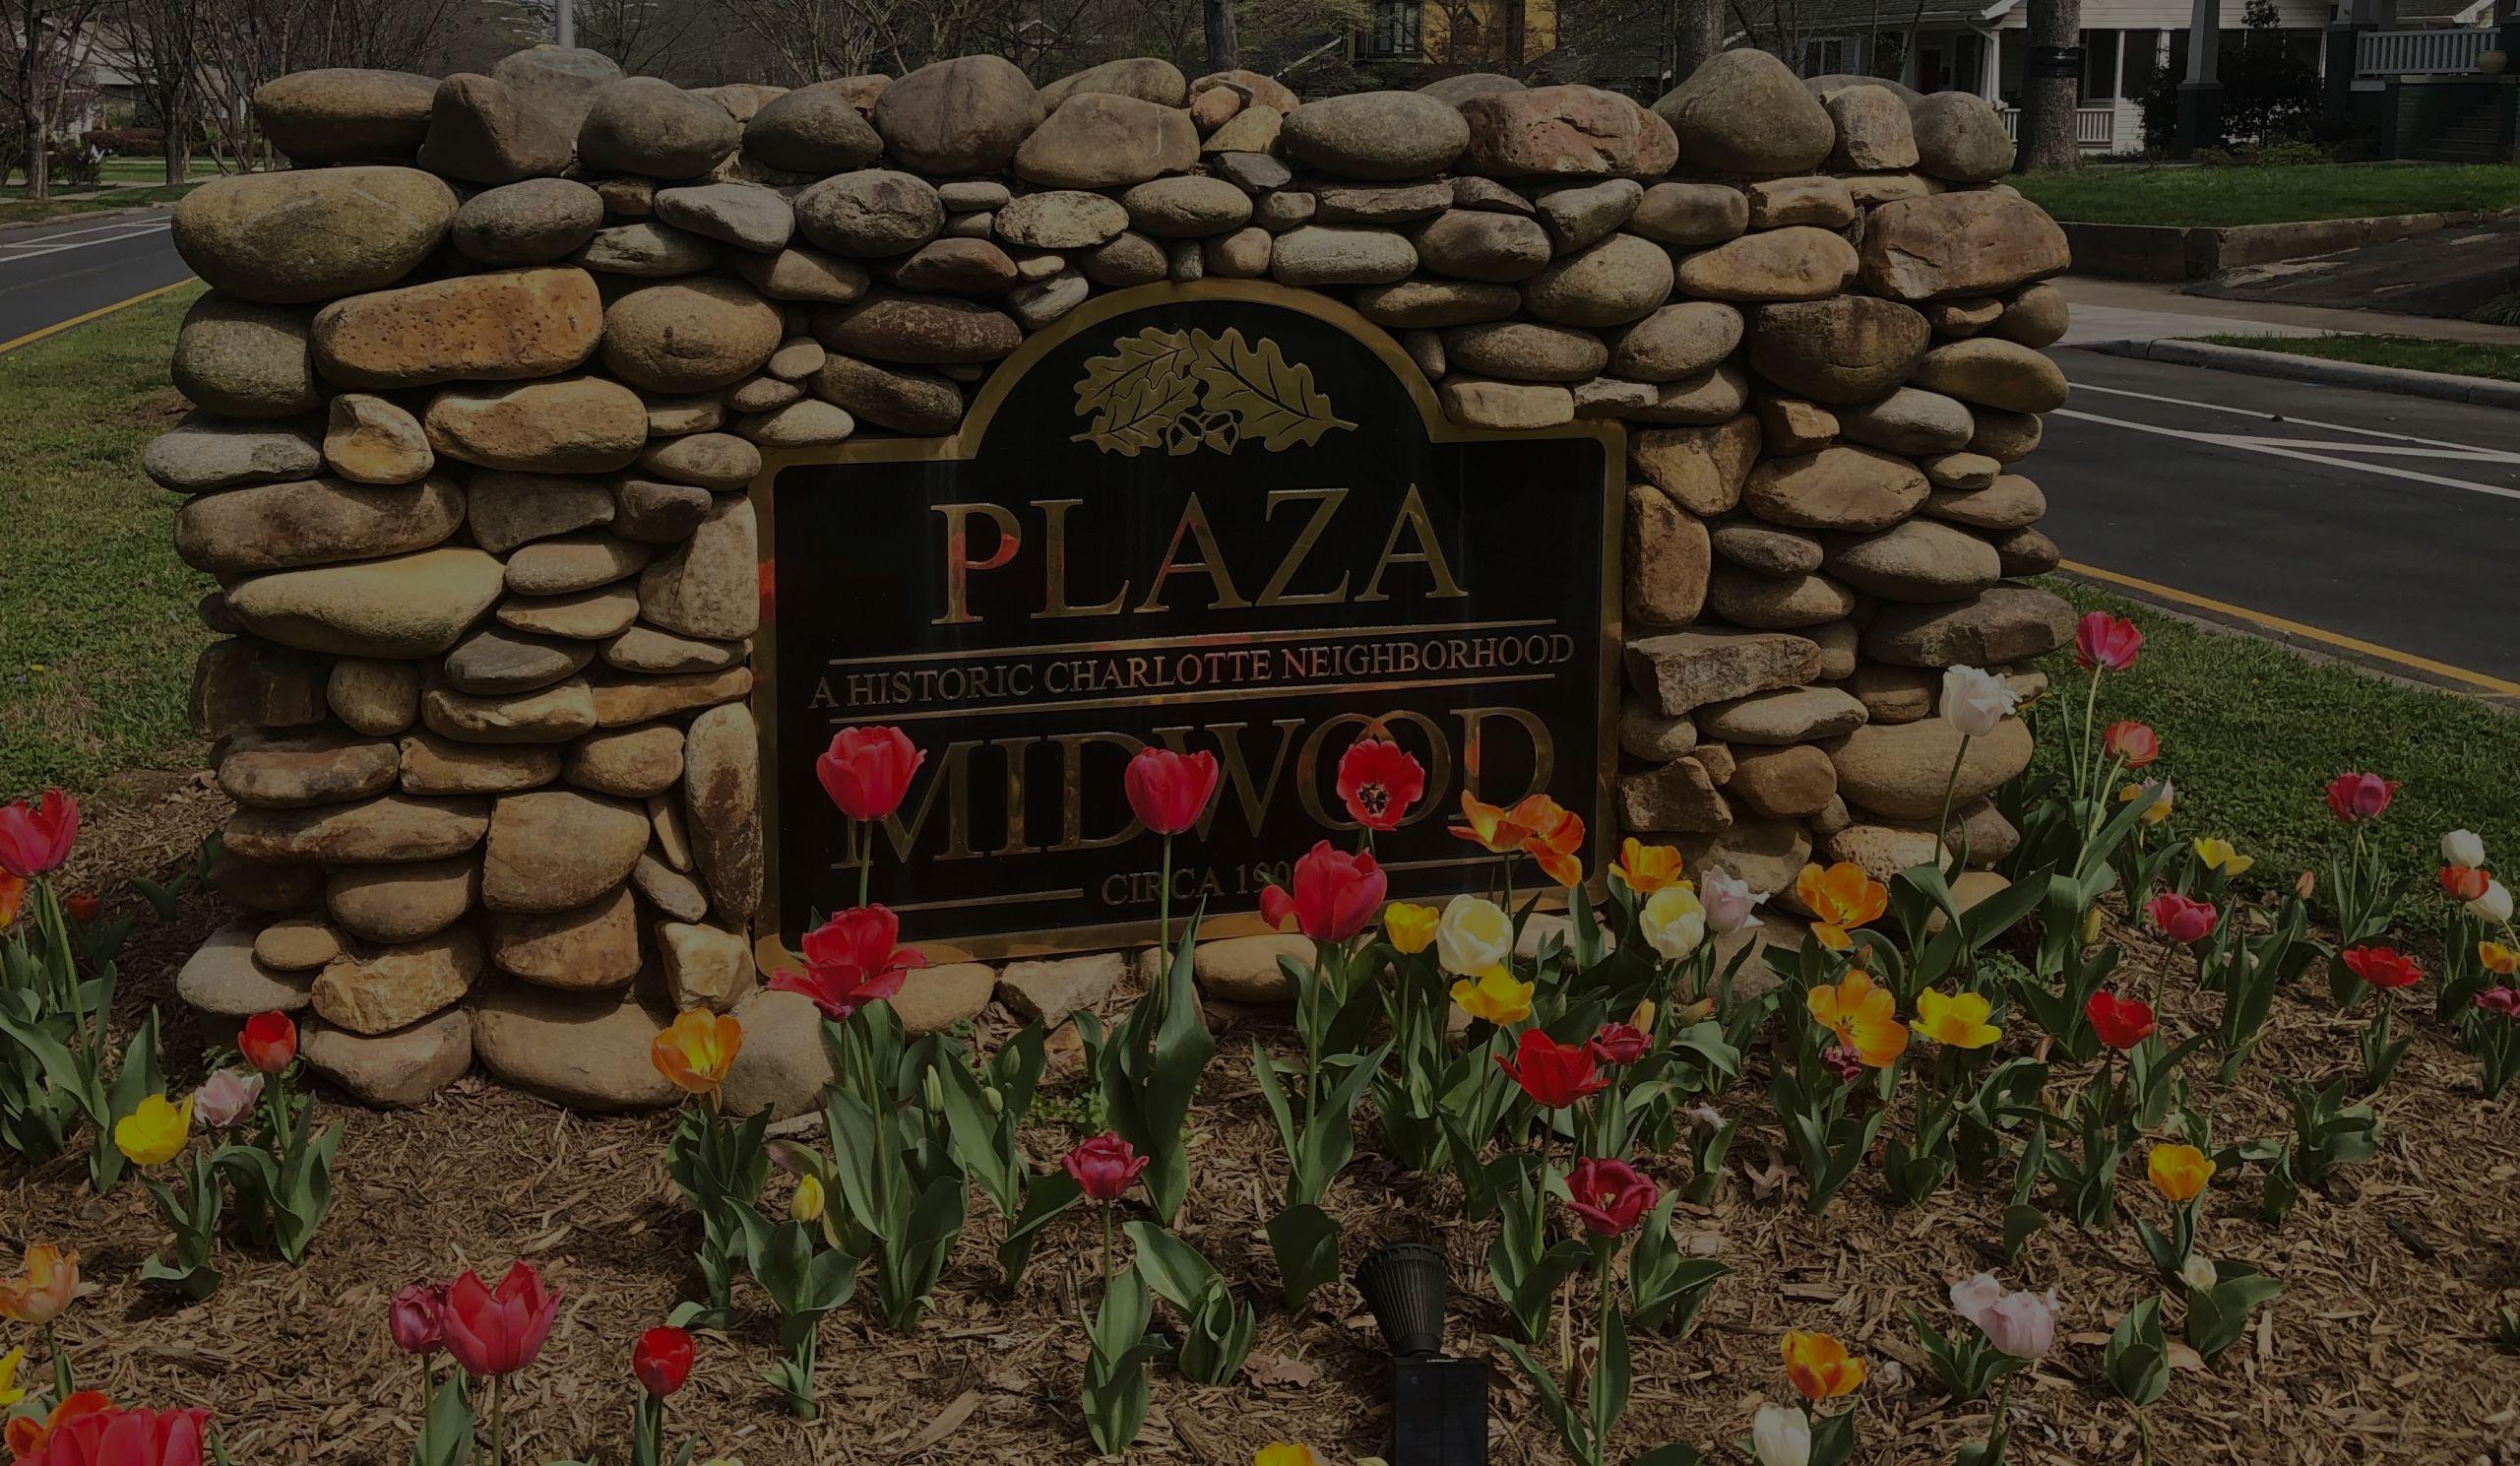 Plaza Midwood Spring 2020